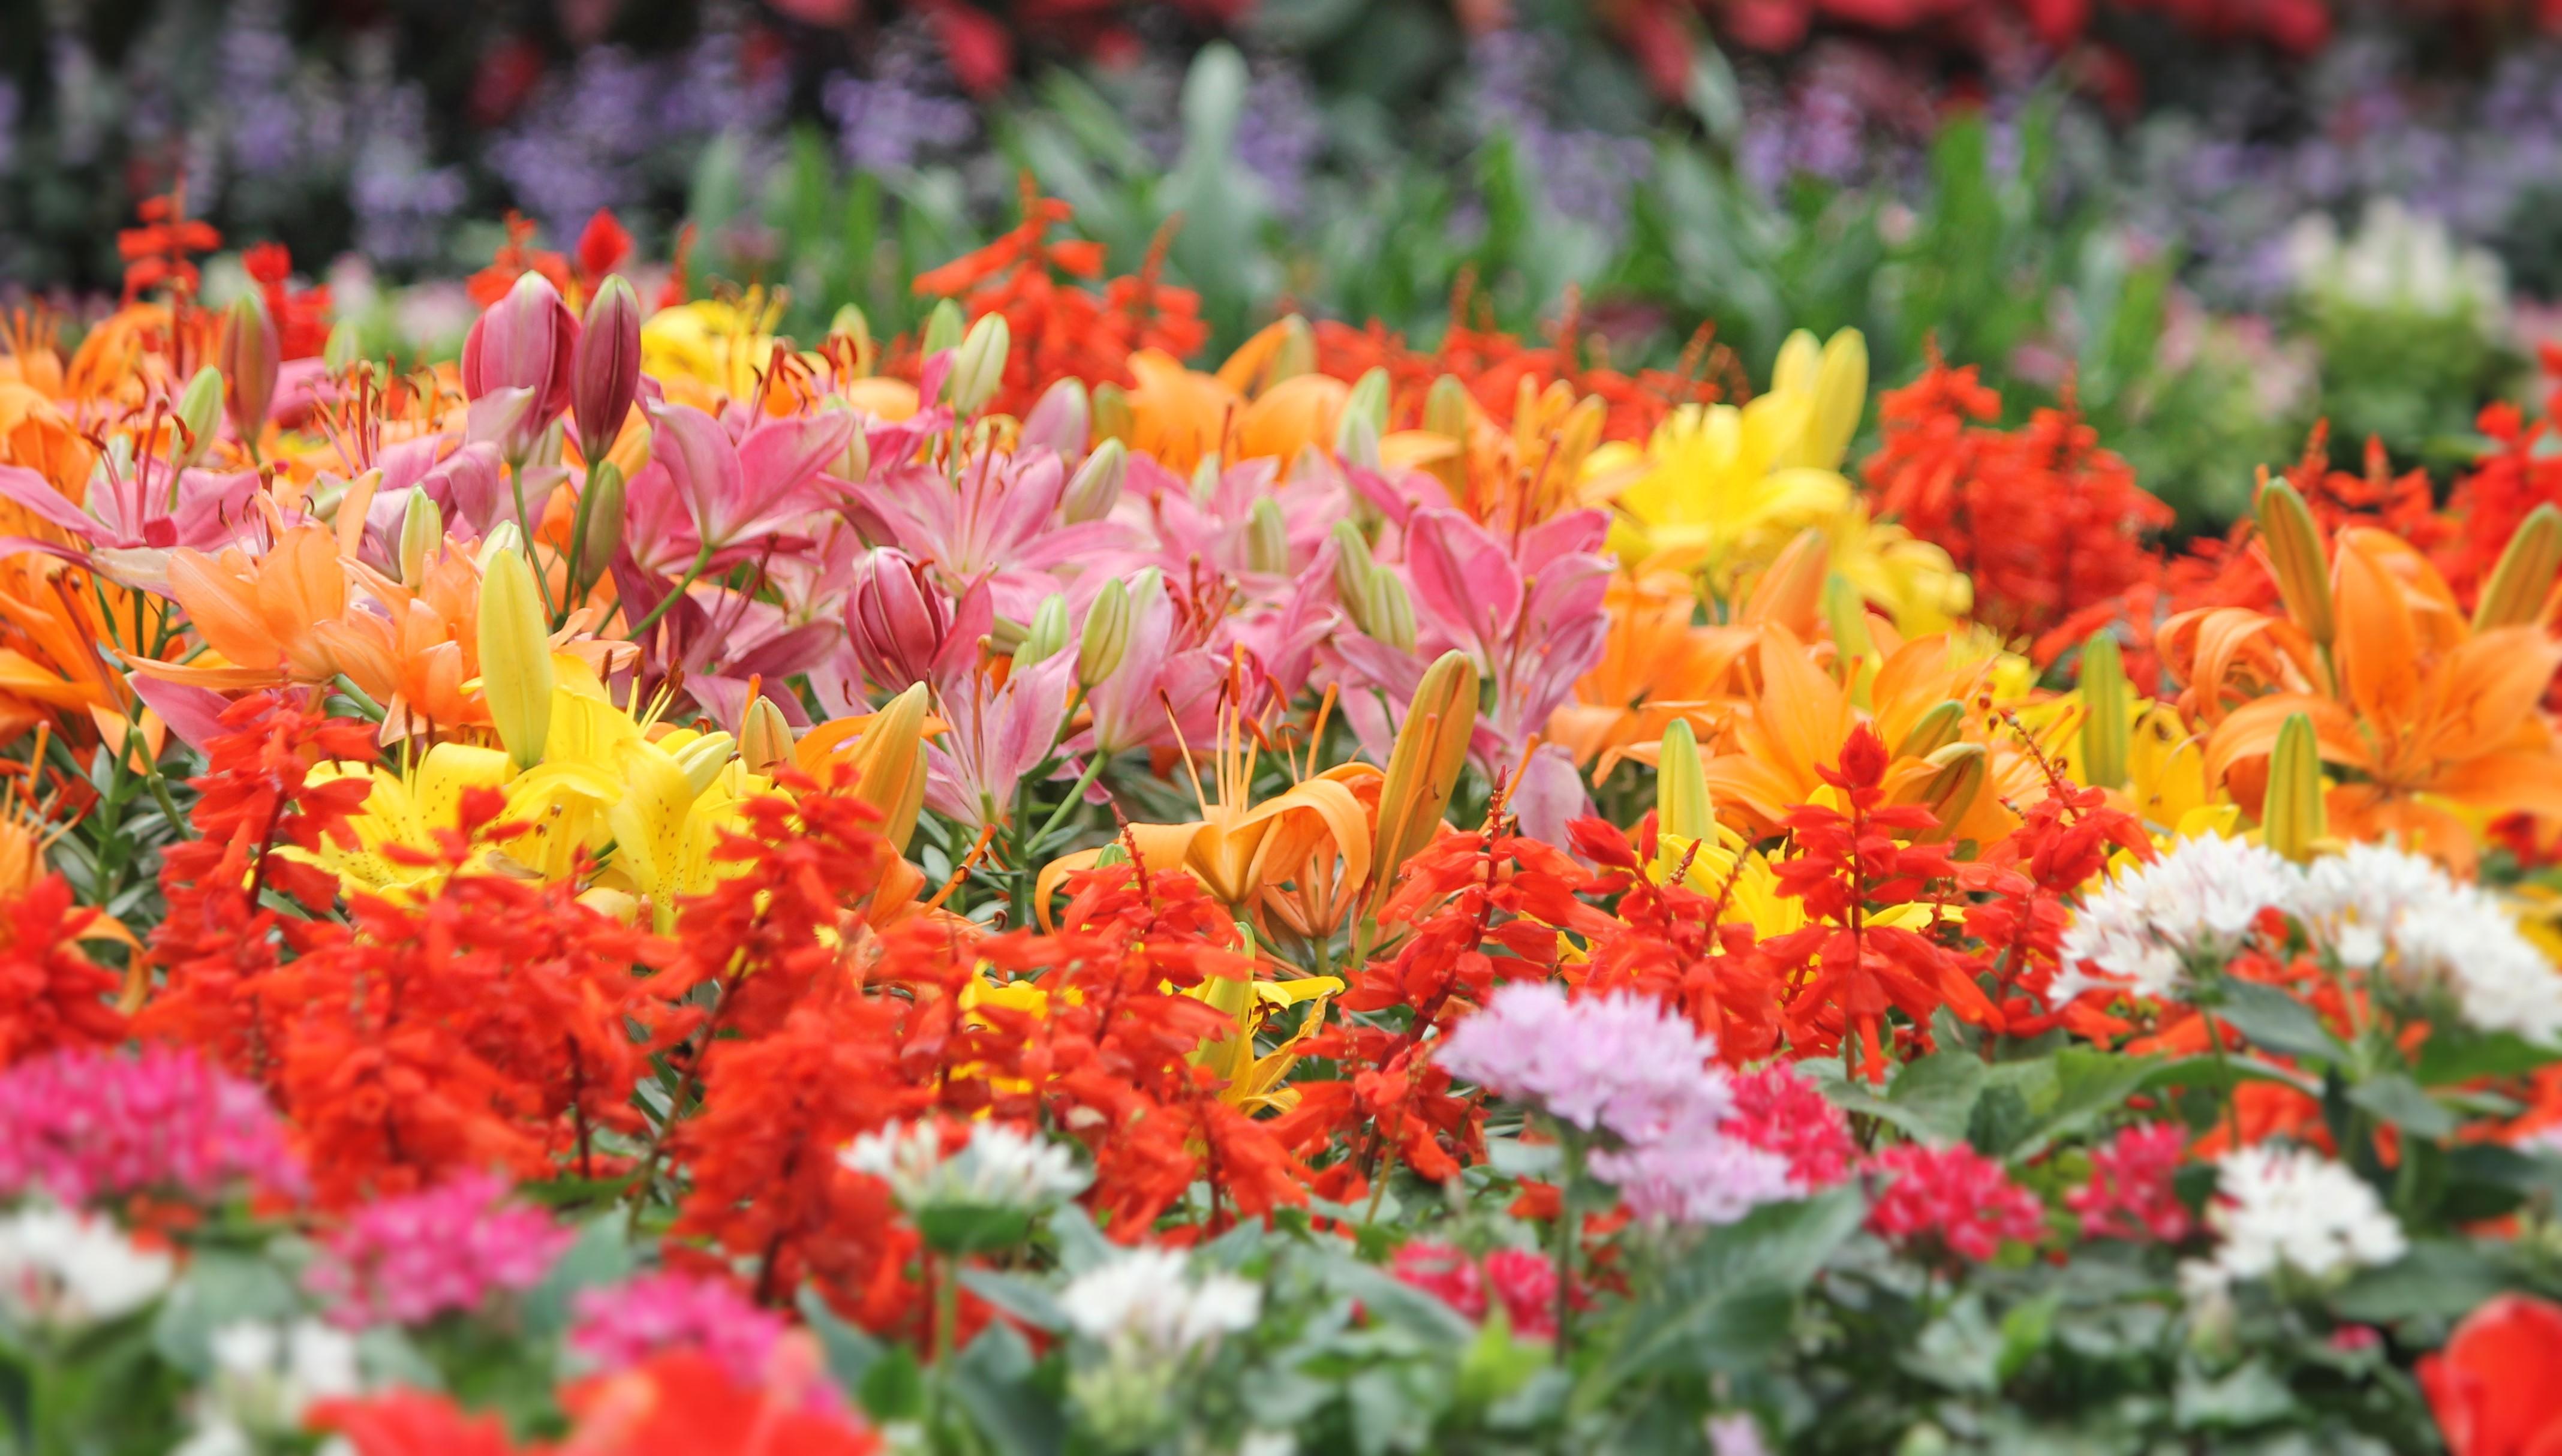 flowers, lilies, sofspics